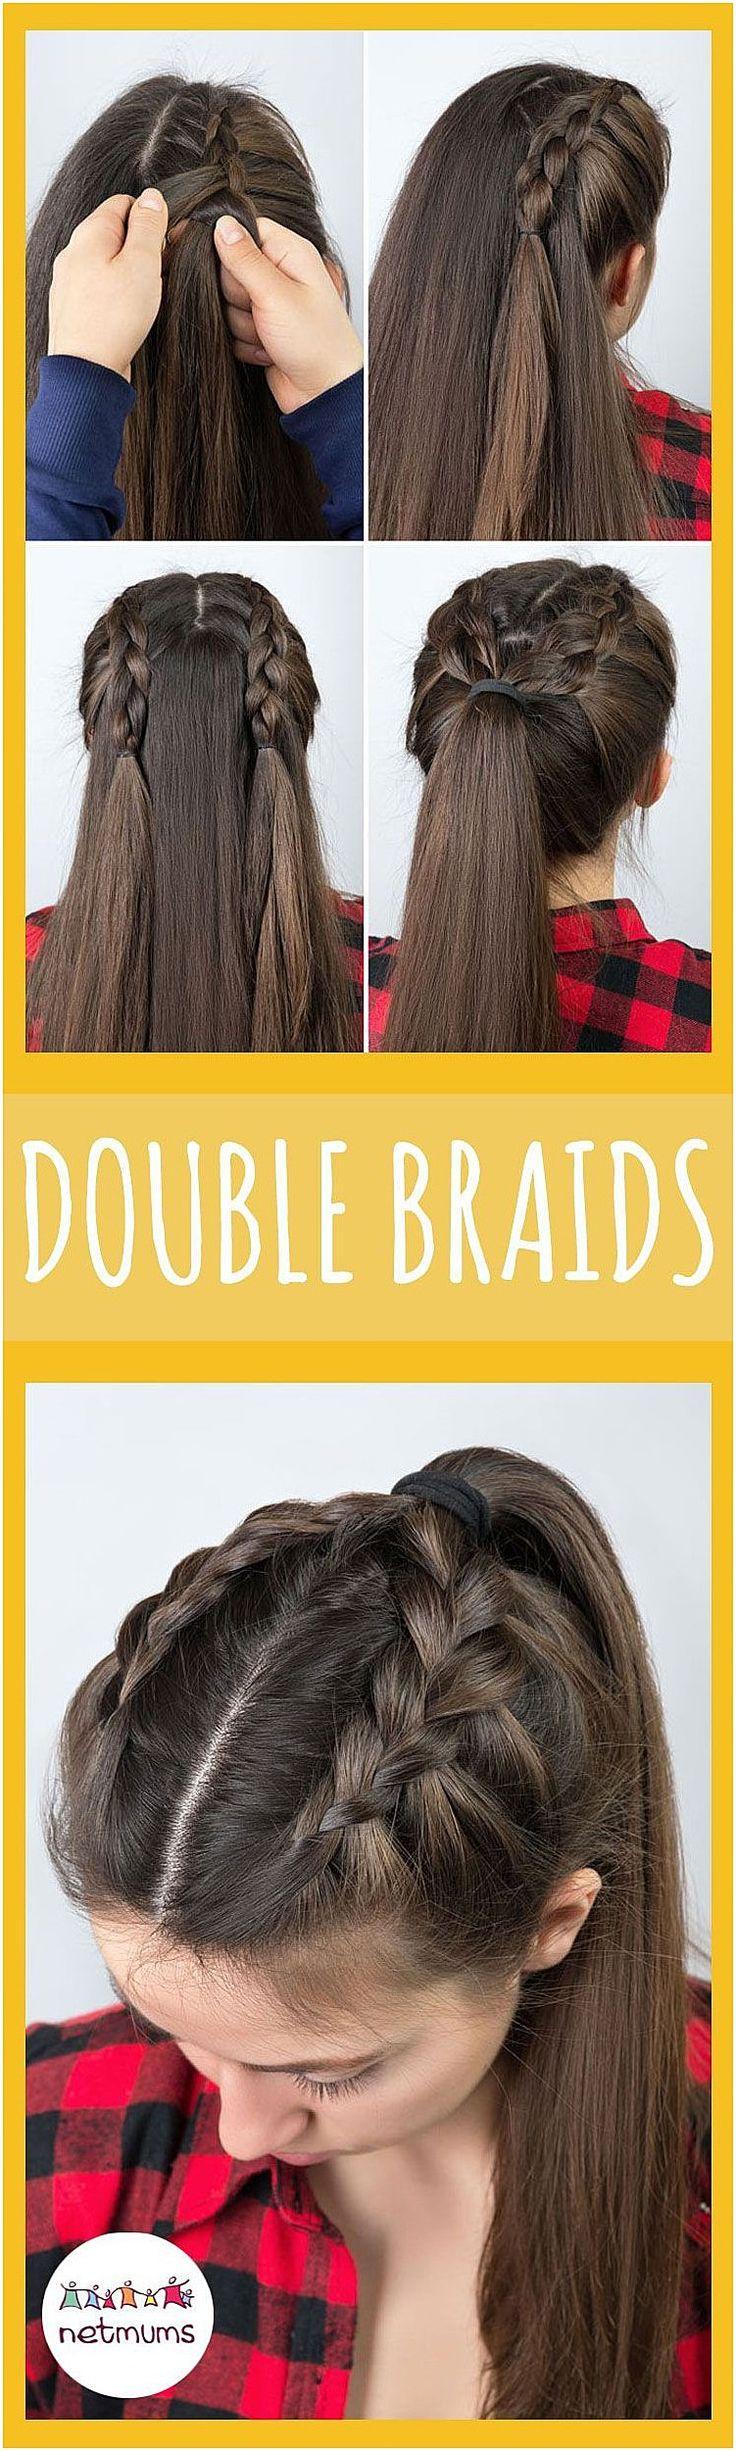 best peinados trensas images on pinterest hair ideas